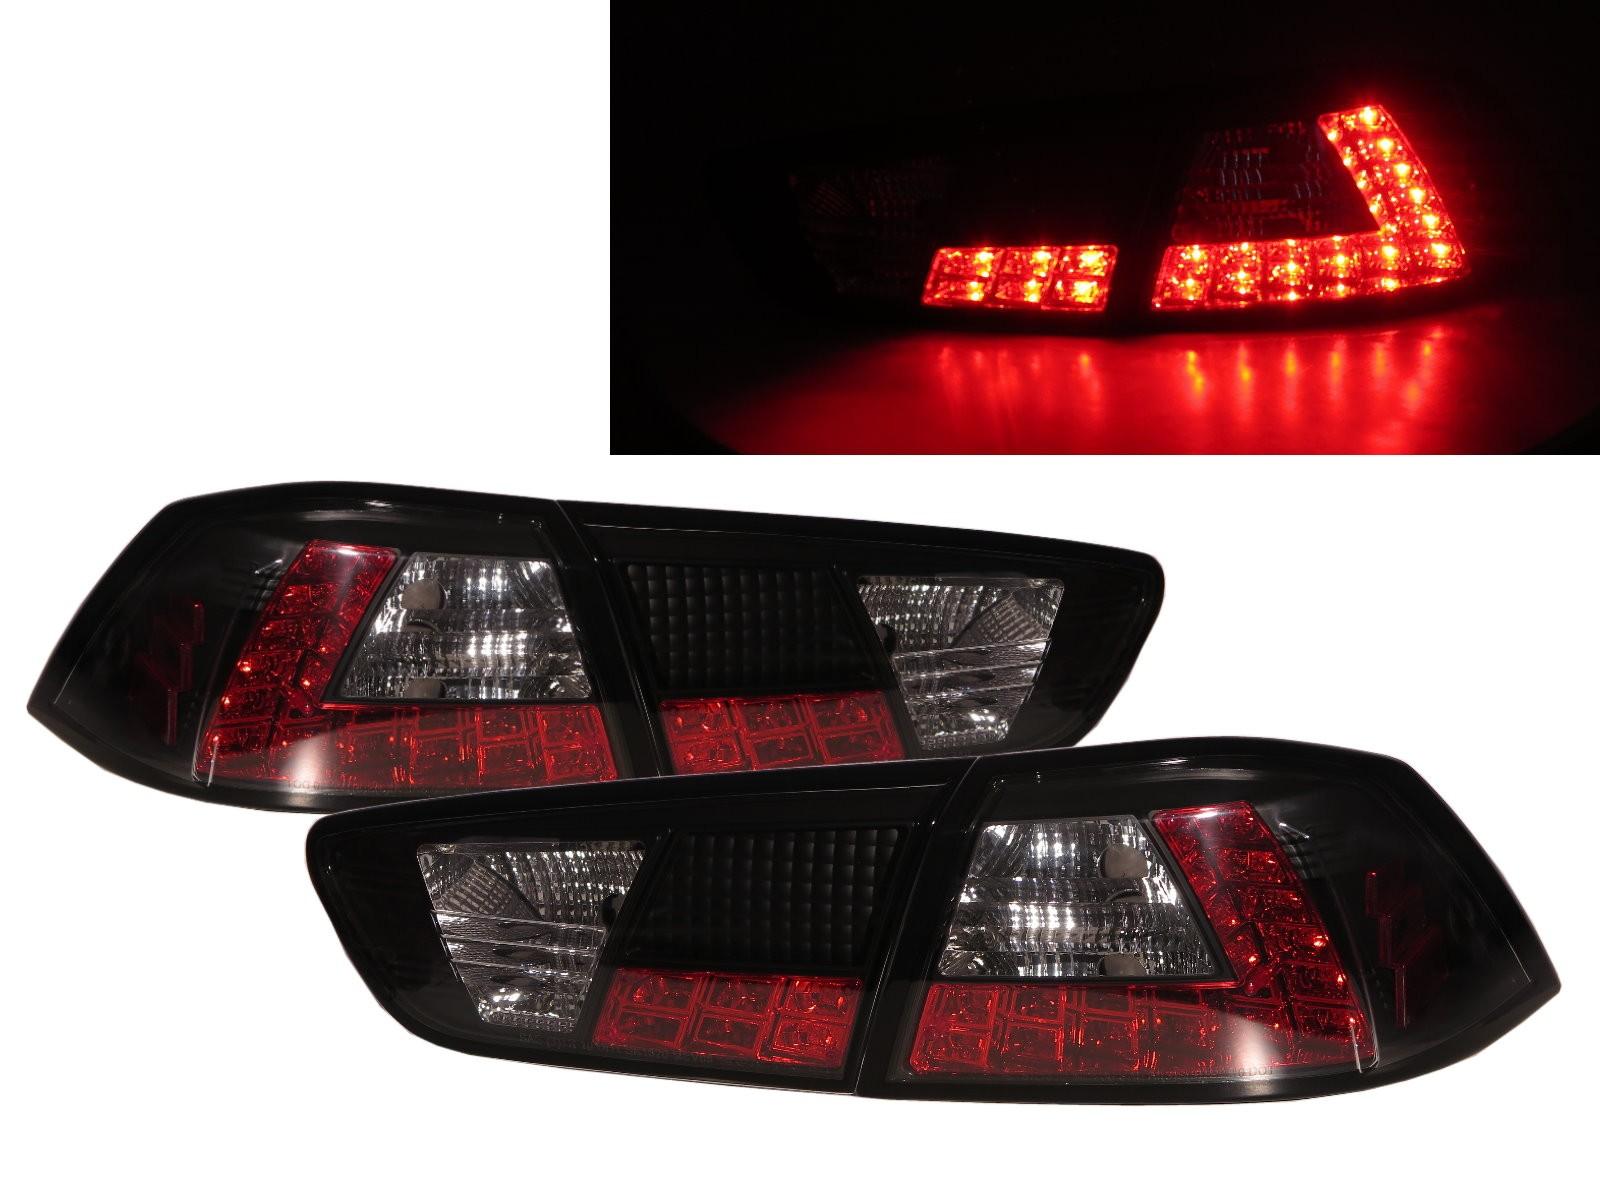 CrazyTheGod LANCER EVOLUTION EVO EVOLUTION EVO X 10 Tenth generation 2008-2016 Sedan 4D LED Tail Rear Light Black V3 for Mitsubishi